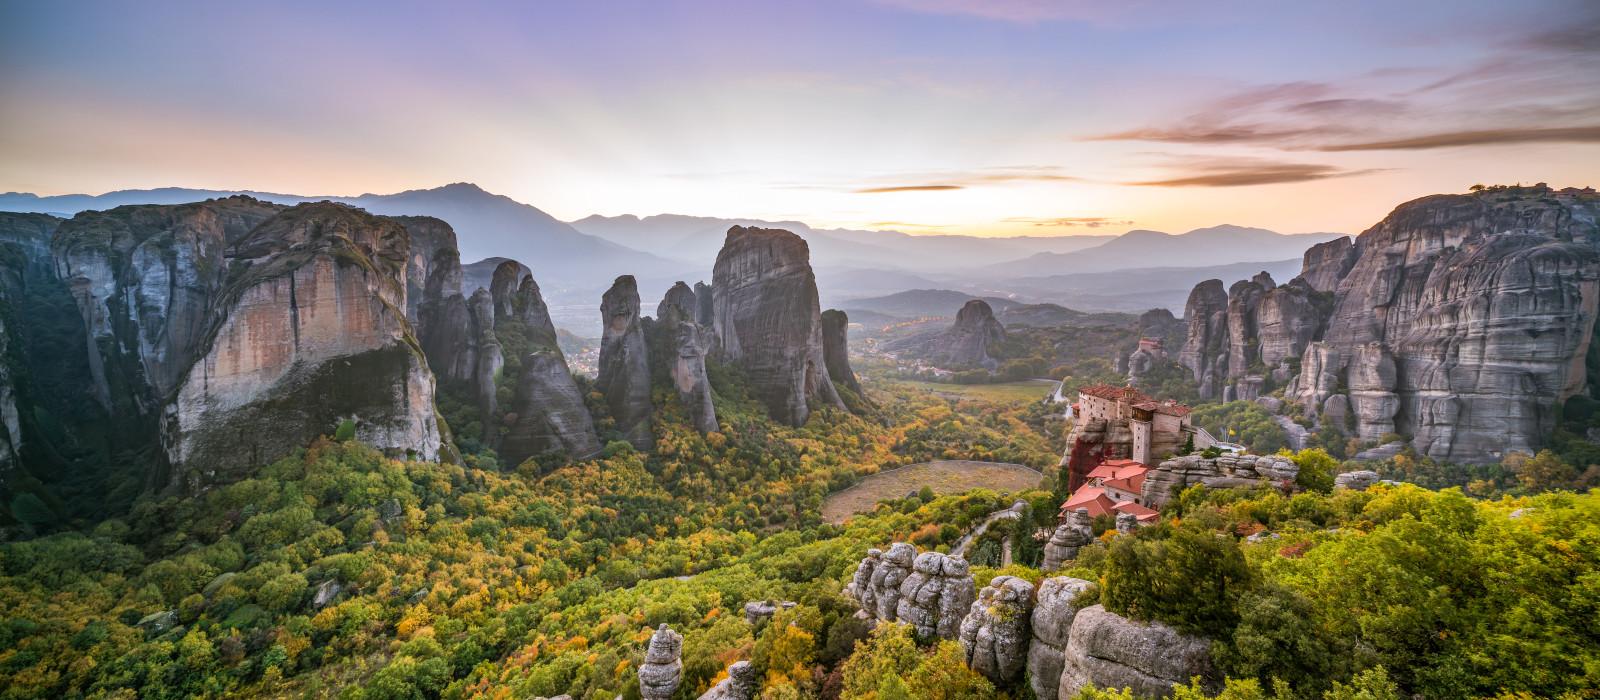 Destination Meteora Greece